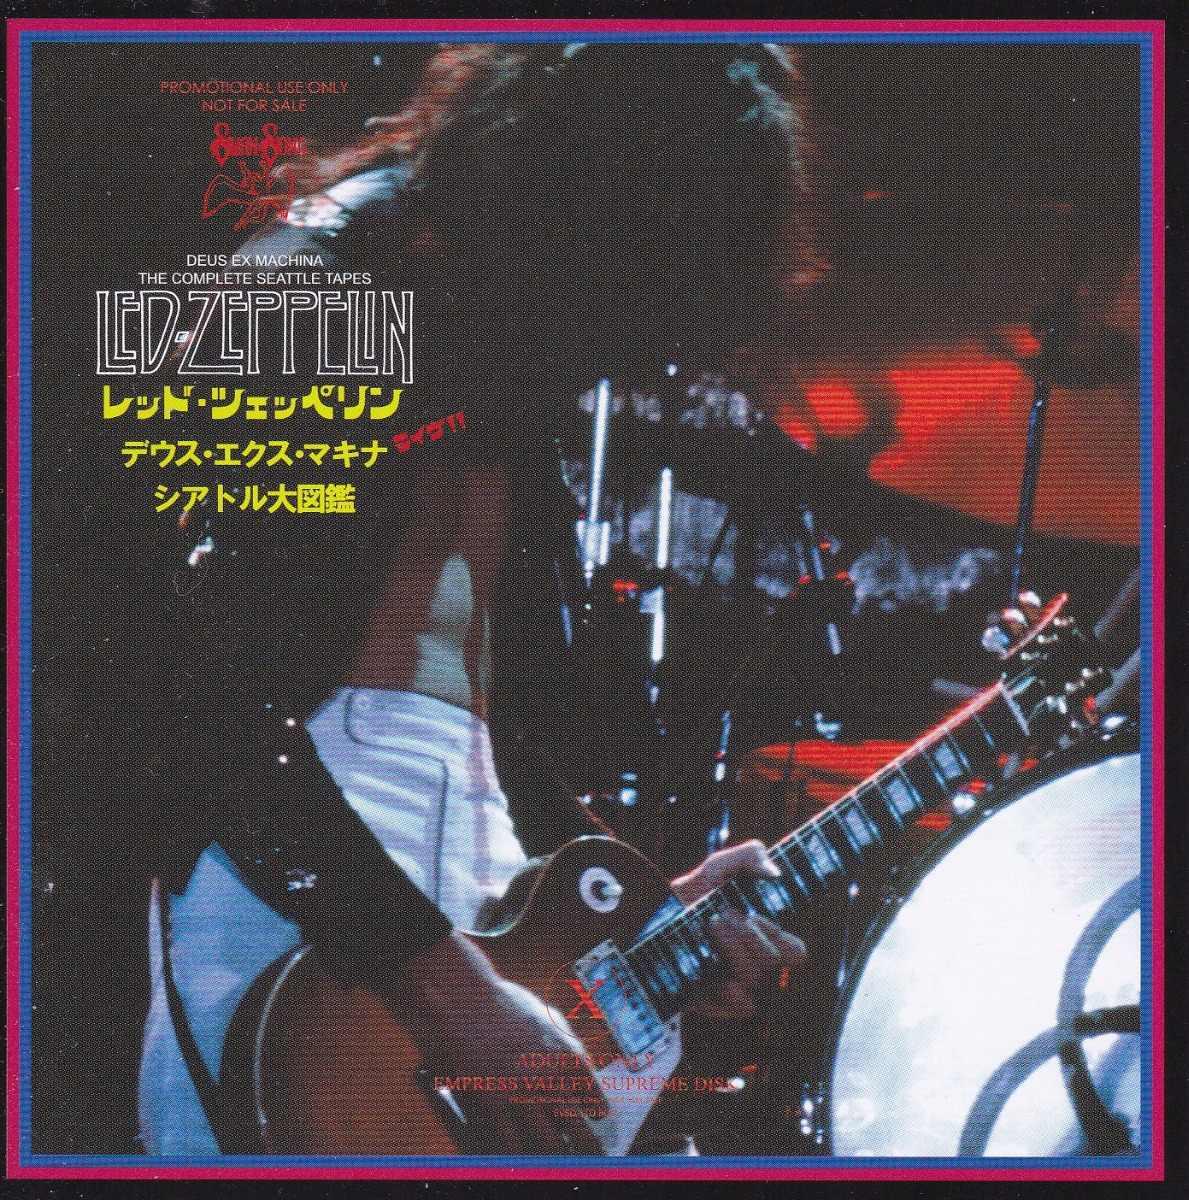 14 Cds - Led Zeppelin Deus Ex Machina